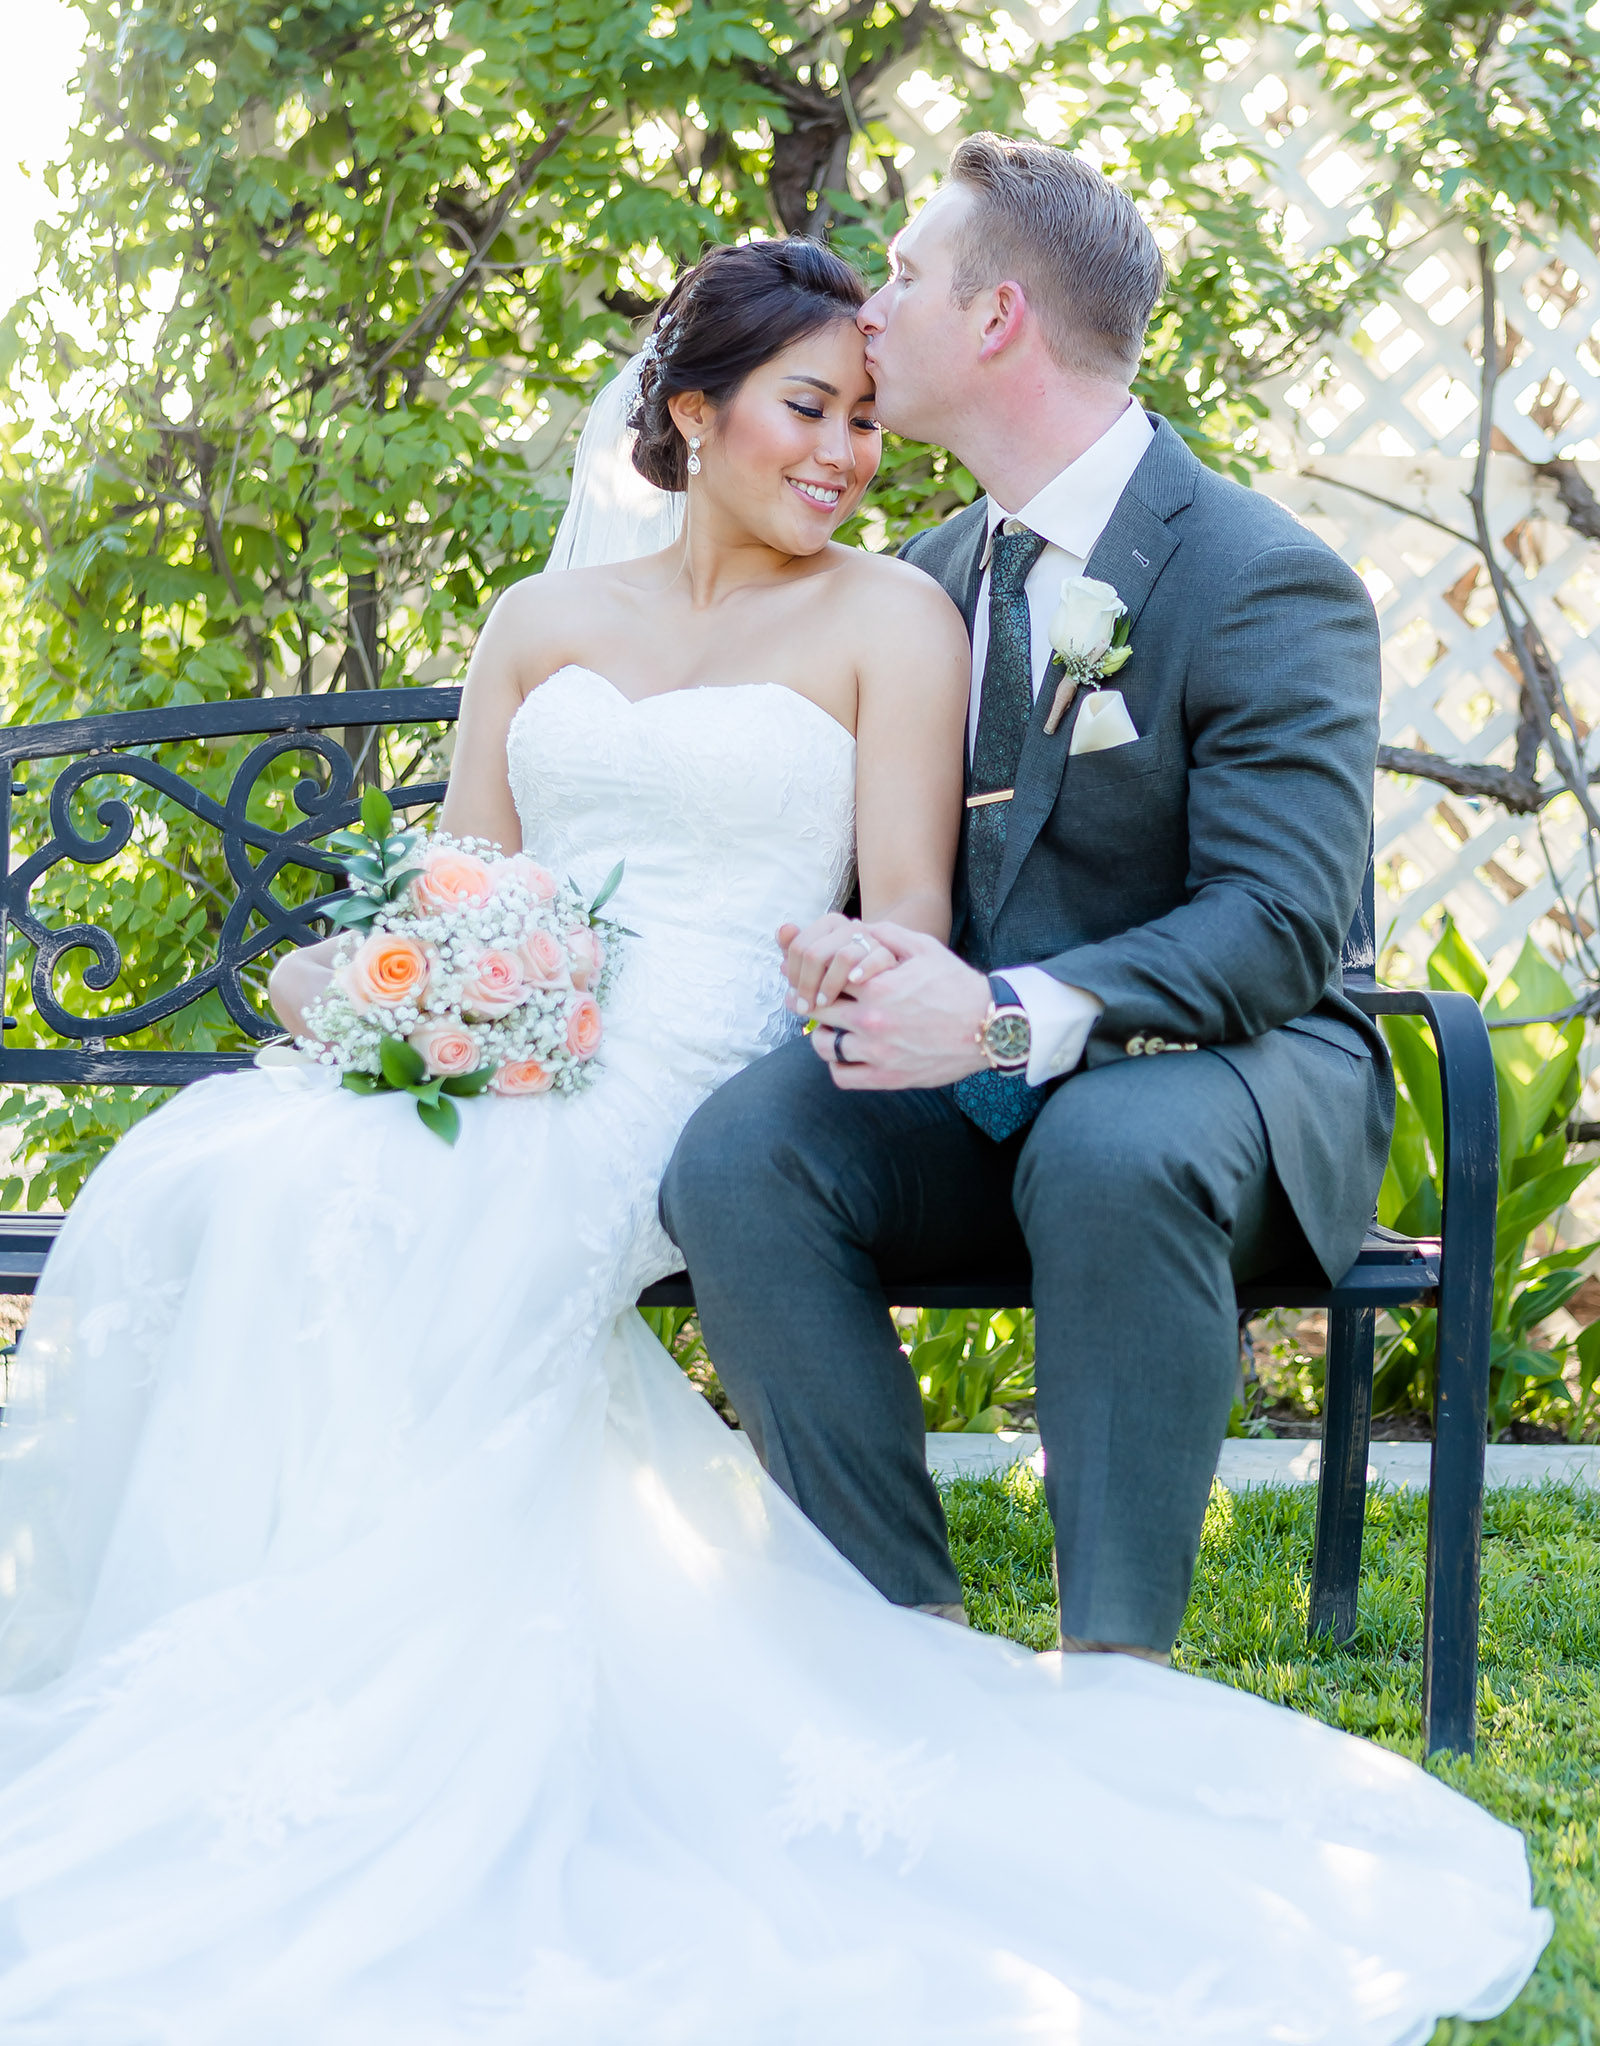 Bride & groom on garden bench - Orchard - Menifee, California - Riverside County - Wedgewood Weddings